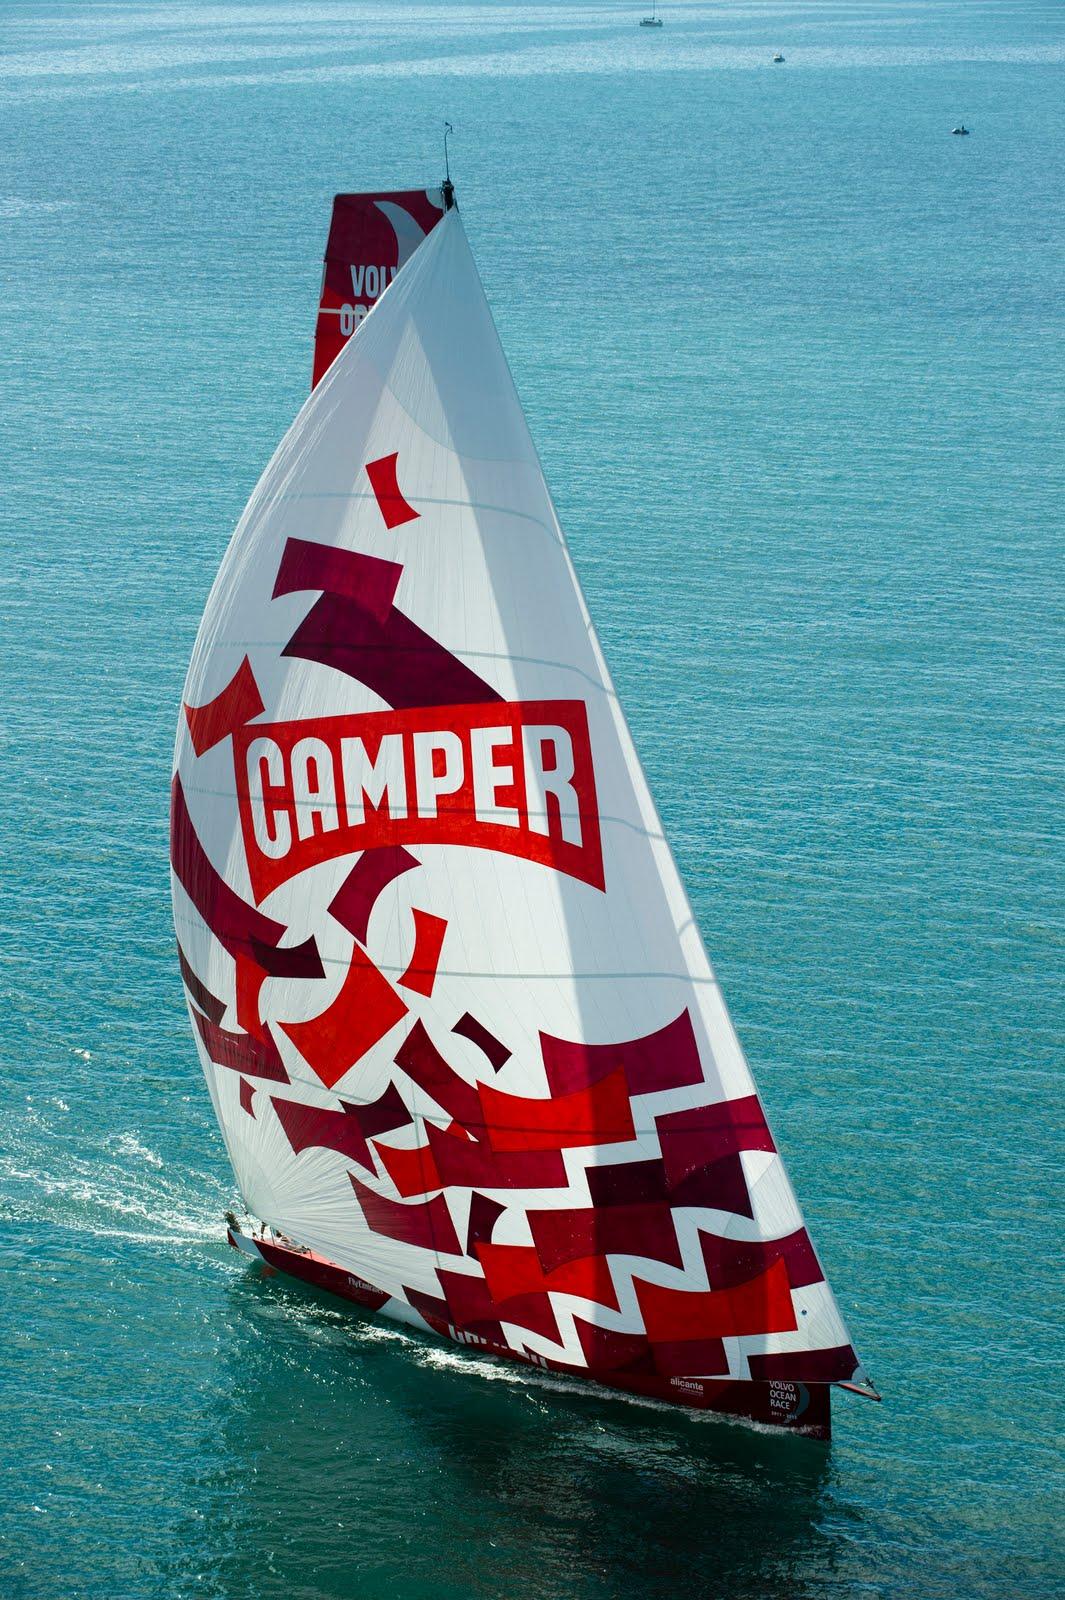 Camper needs more days of